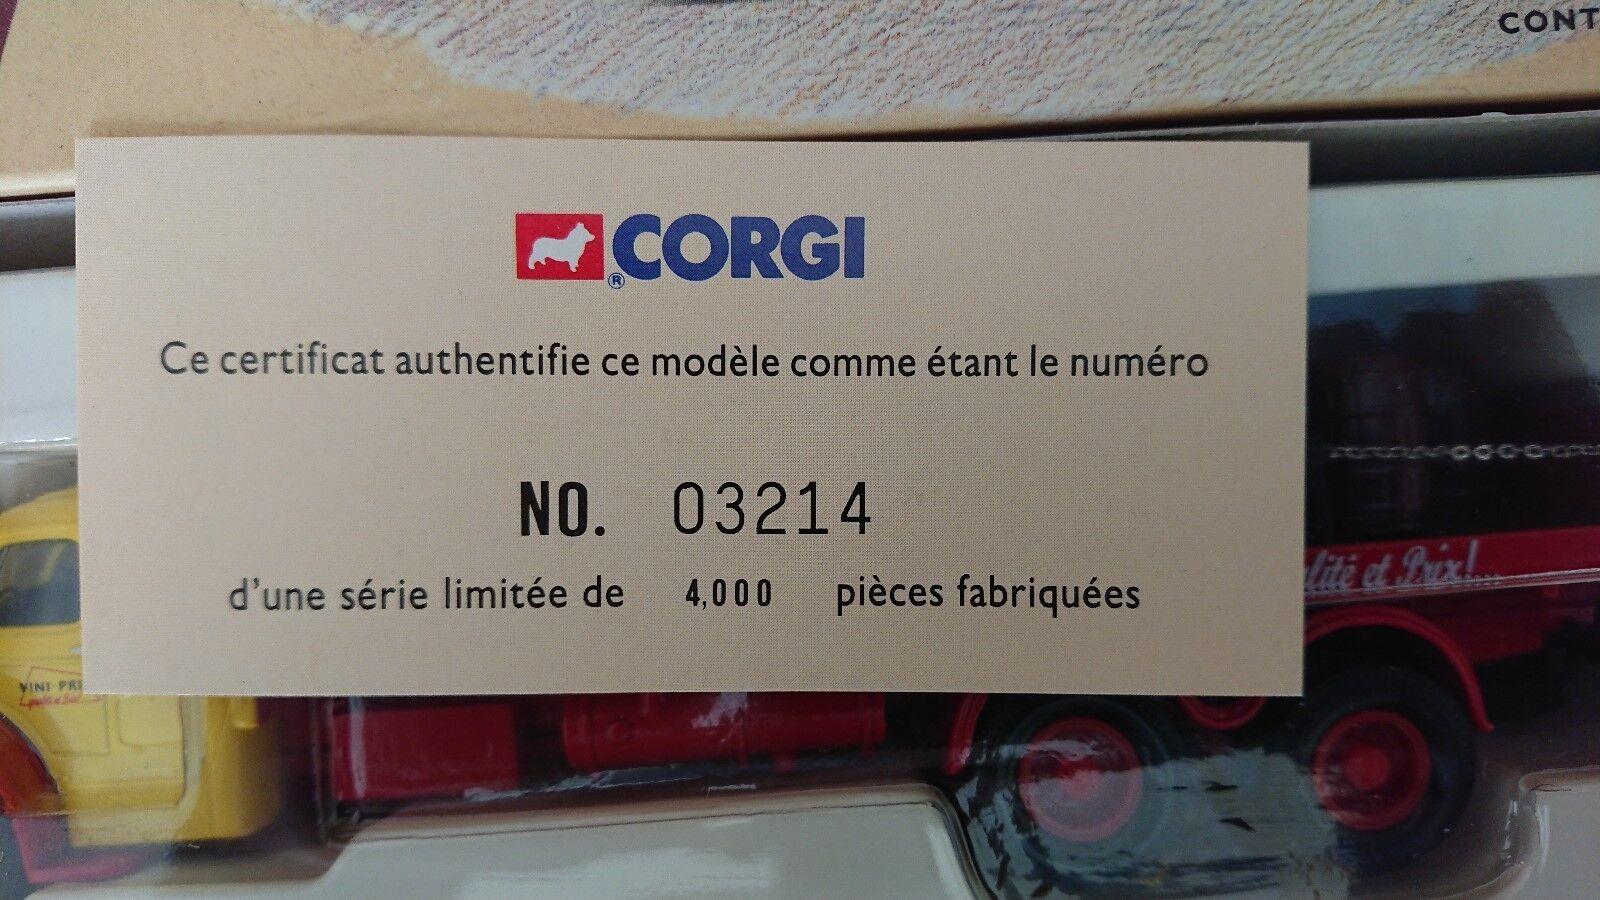 Corgi 73101 Berliet GLR8 Brasseur VINI-PRIX Ltd Edit Edit Edit No. 3214 of 4000 58e245